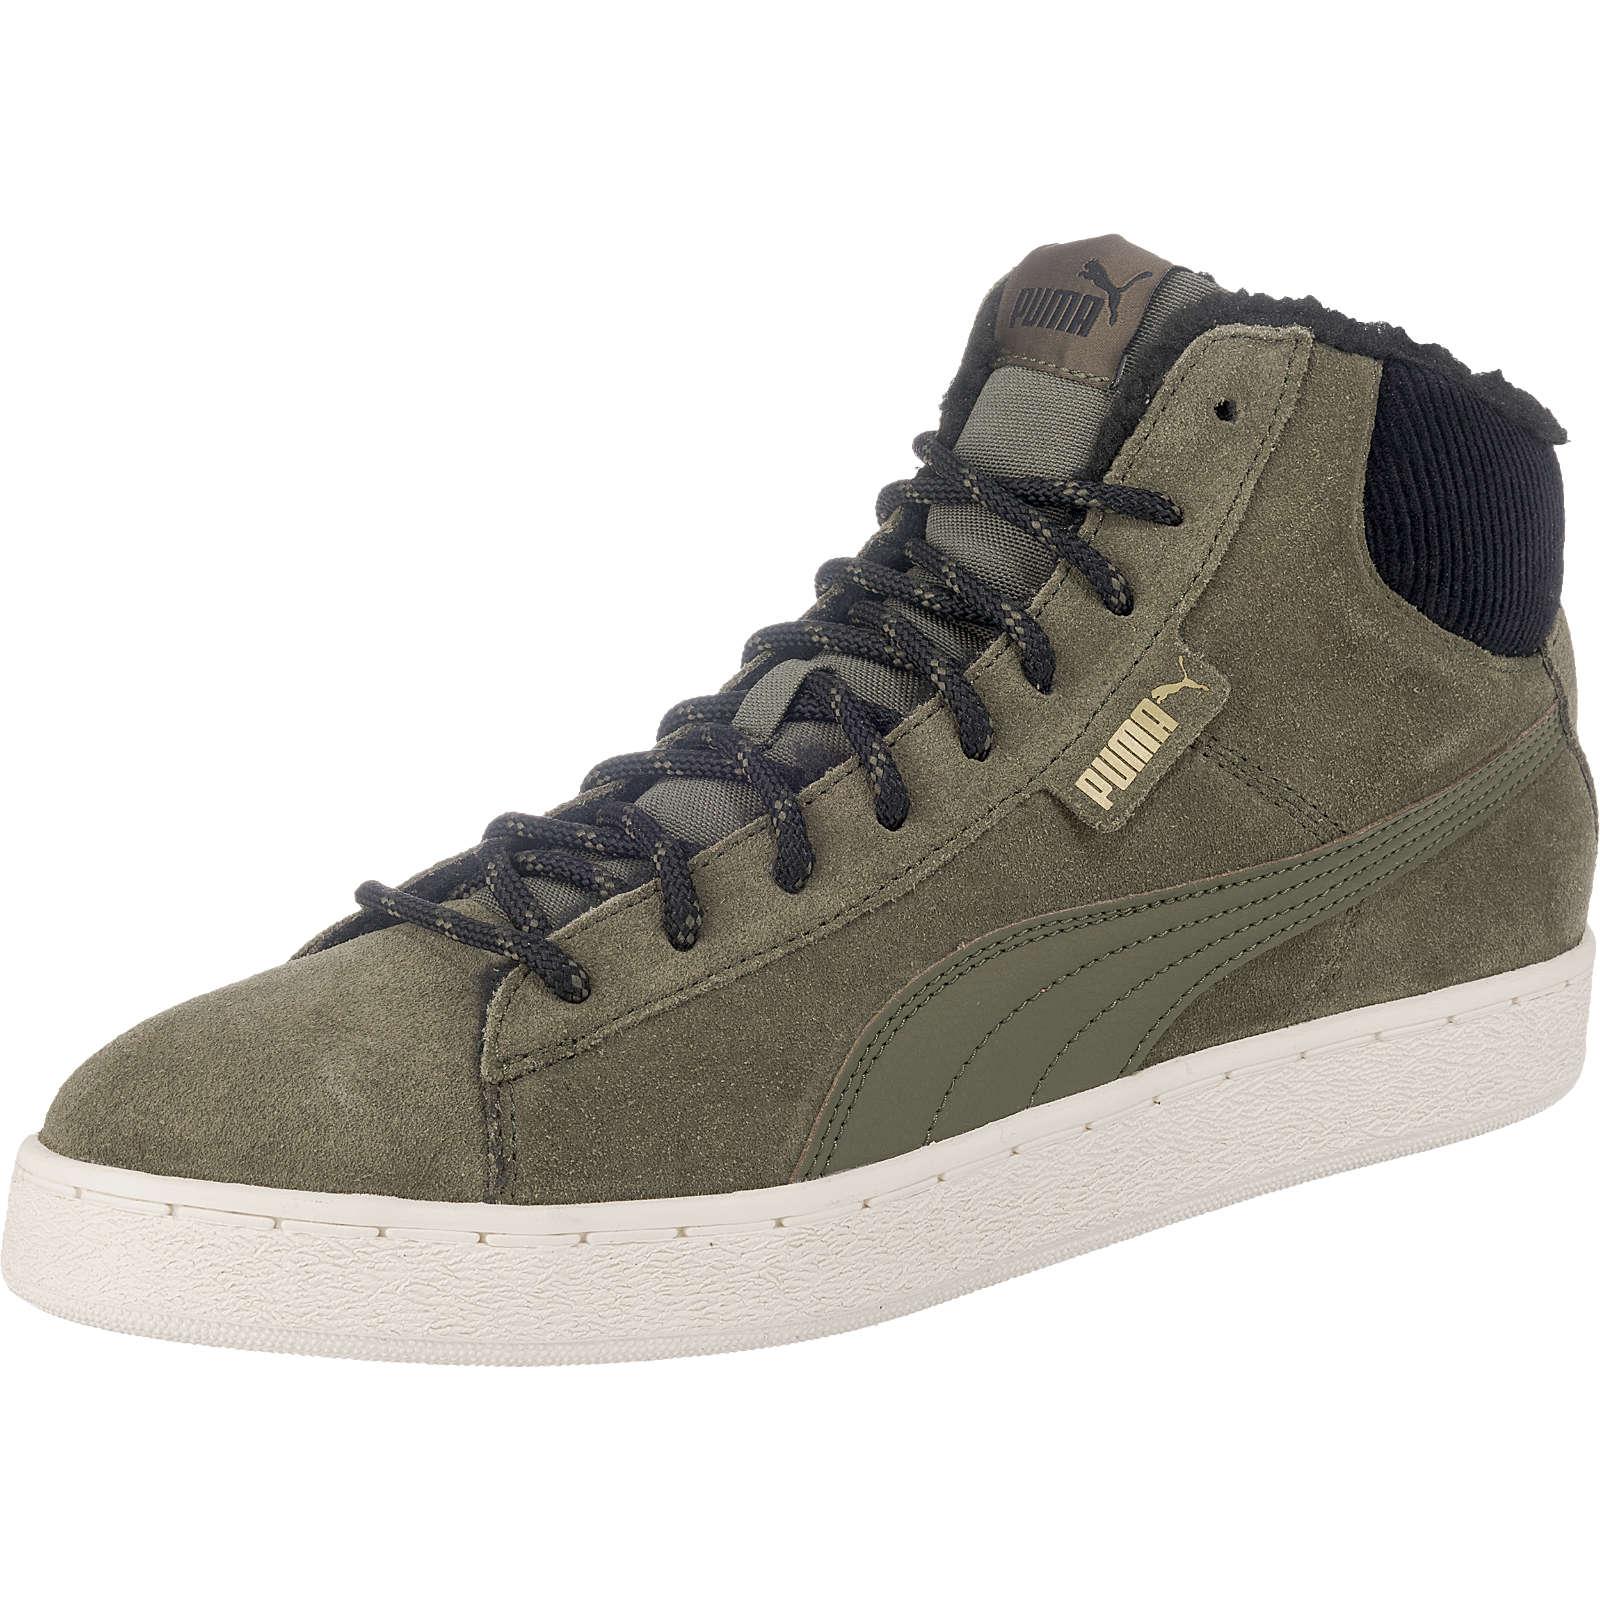 PUMA 1948 Mid Corduroy Sneakers grün Herren Gr. 42,5